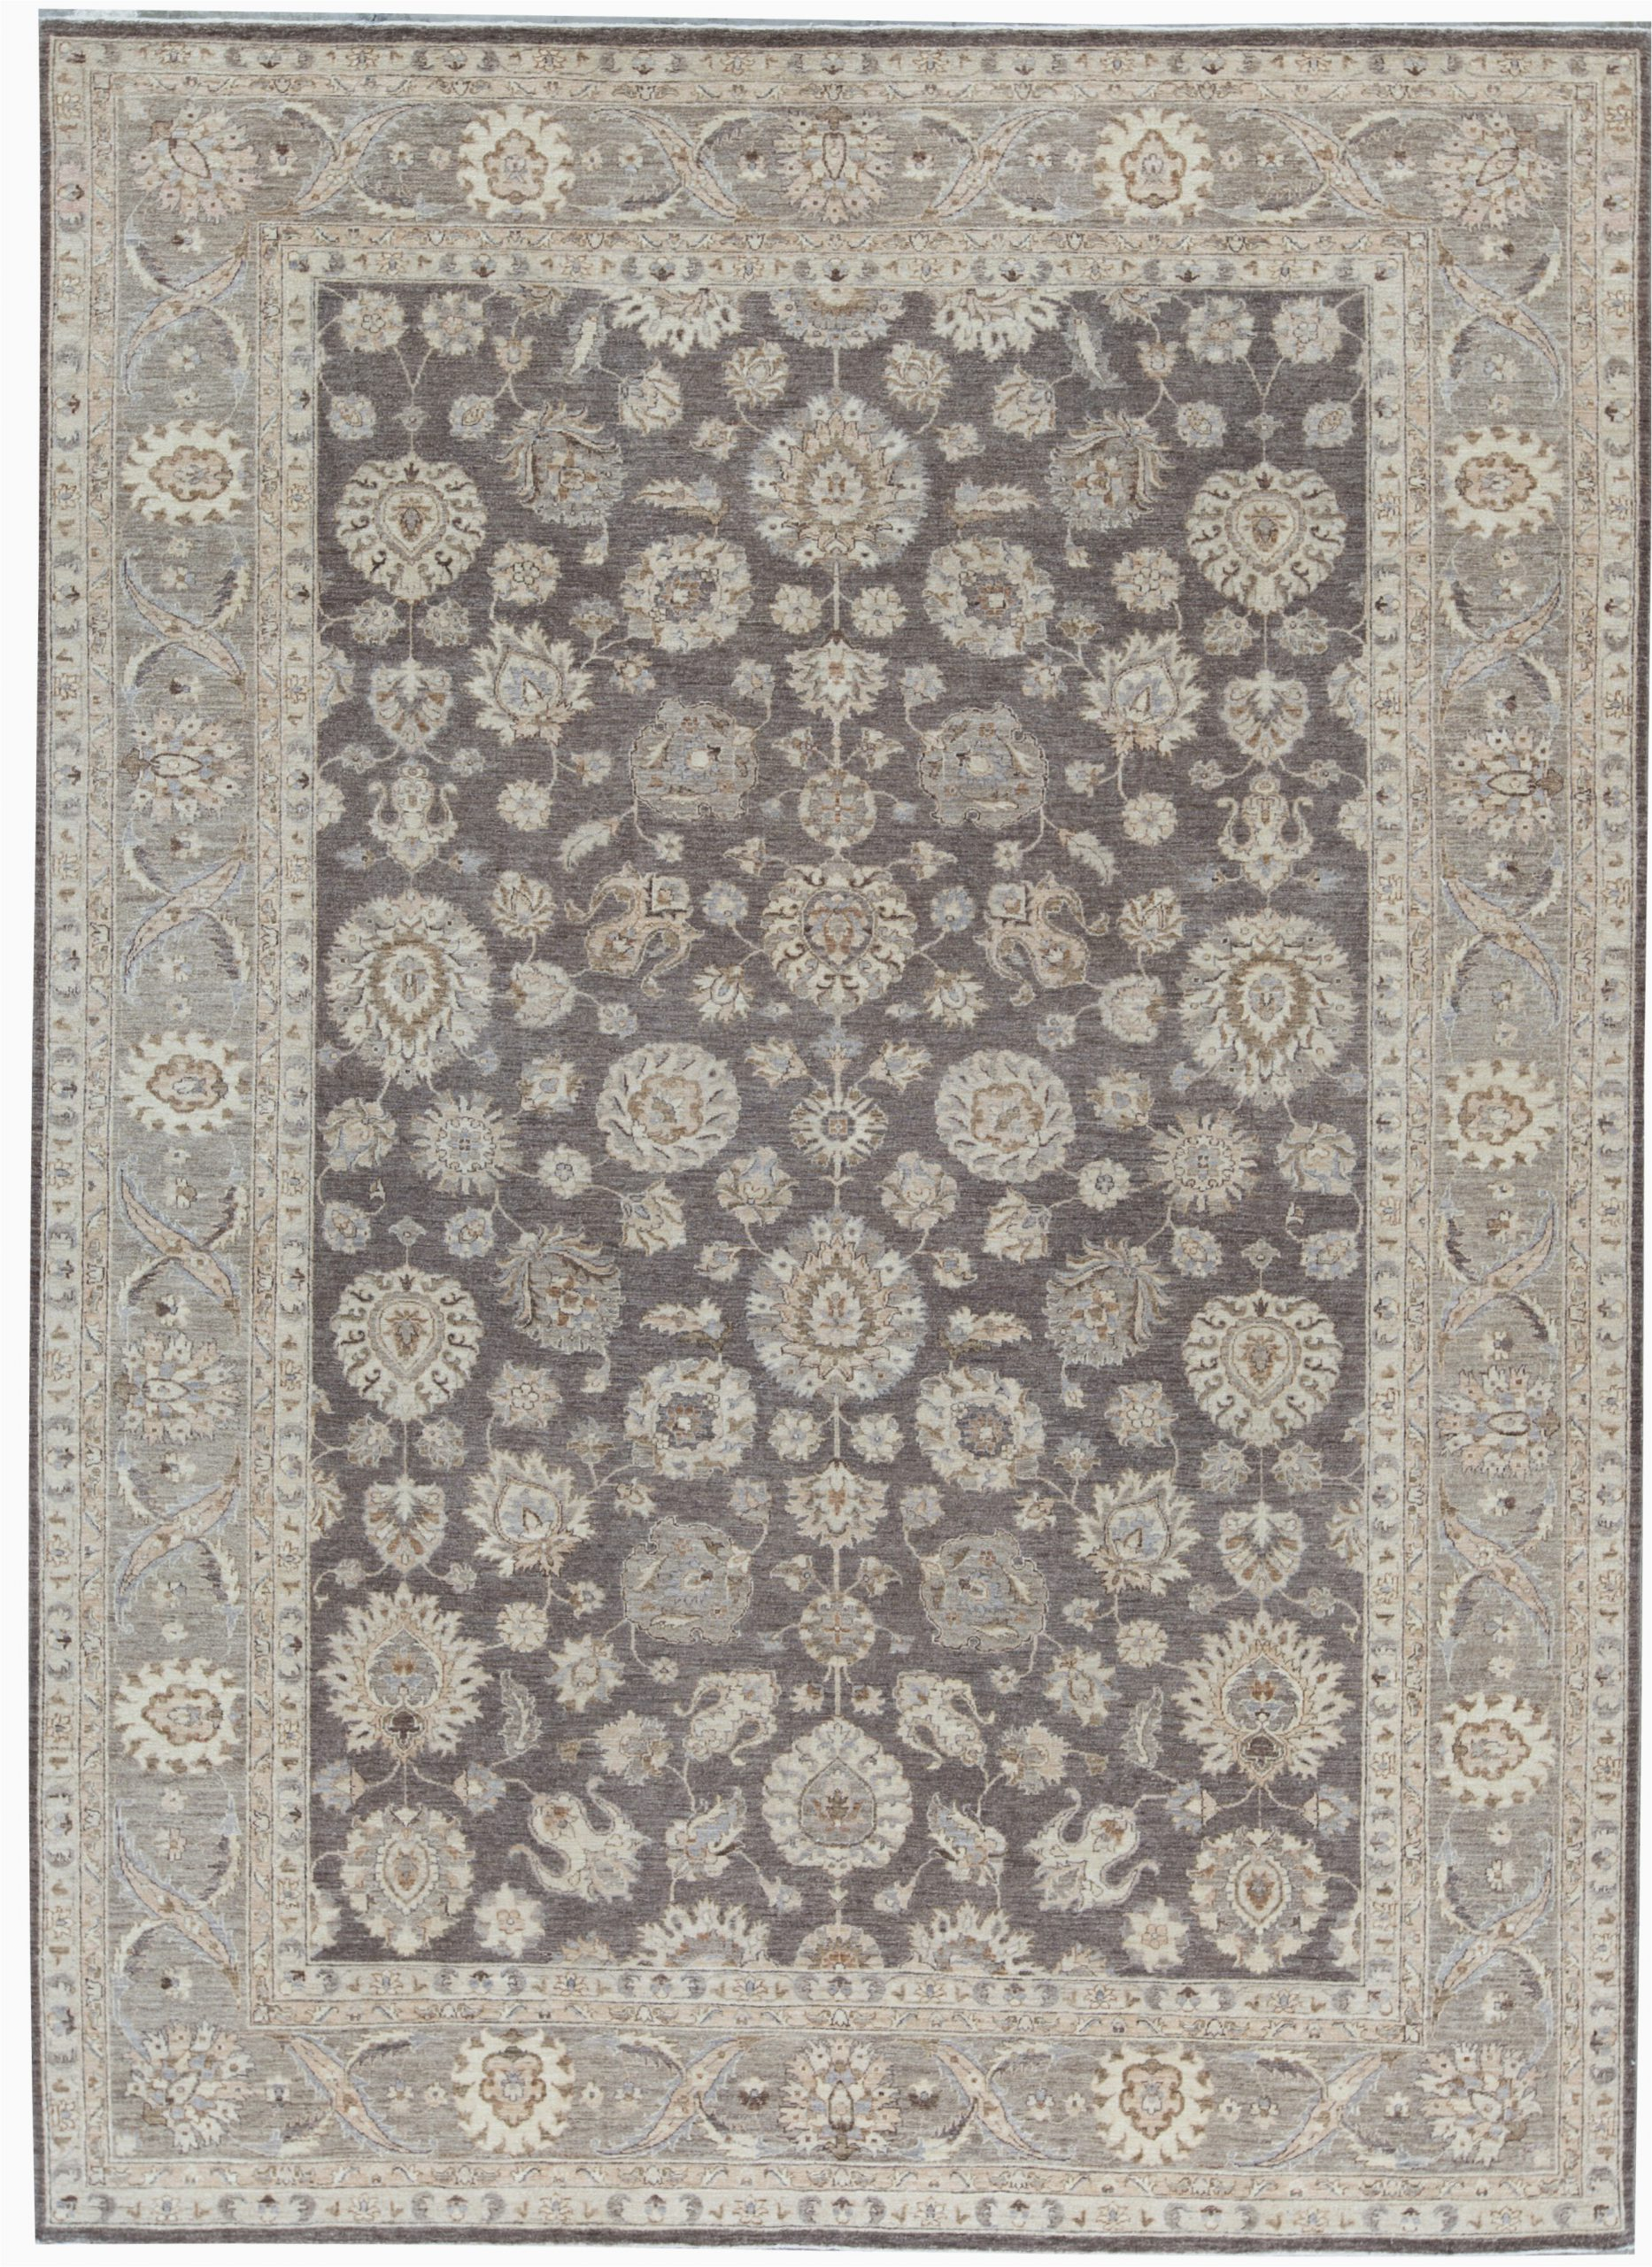 bokara rug co inc one of a kind ziegler hand knotted 98 x 133 wool gray area rug abhd5610